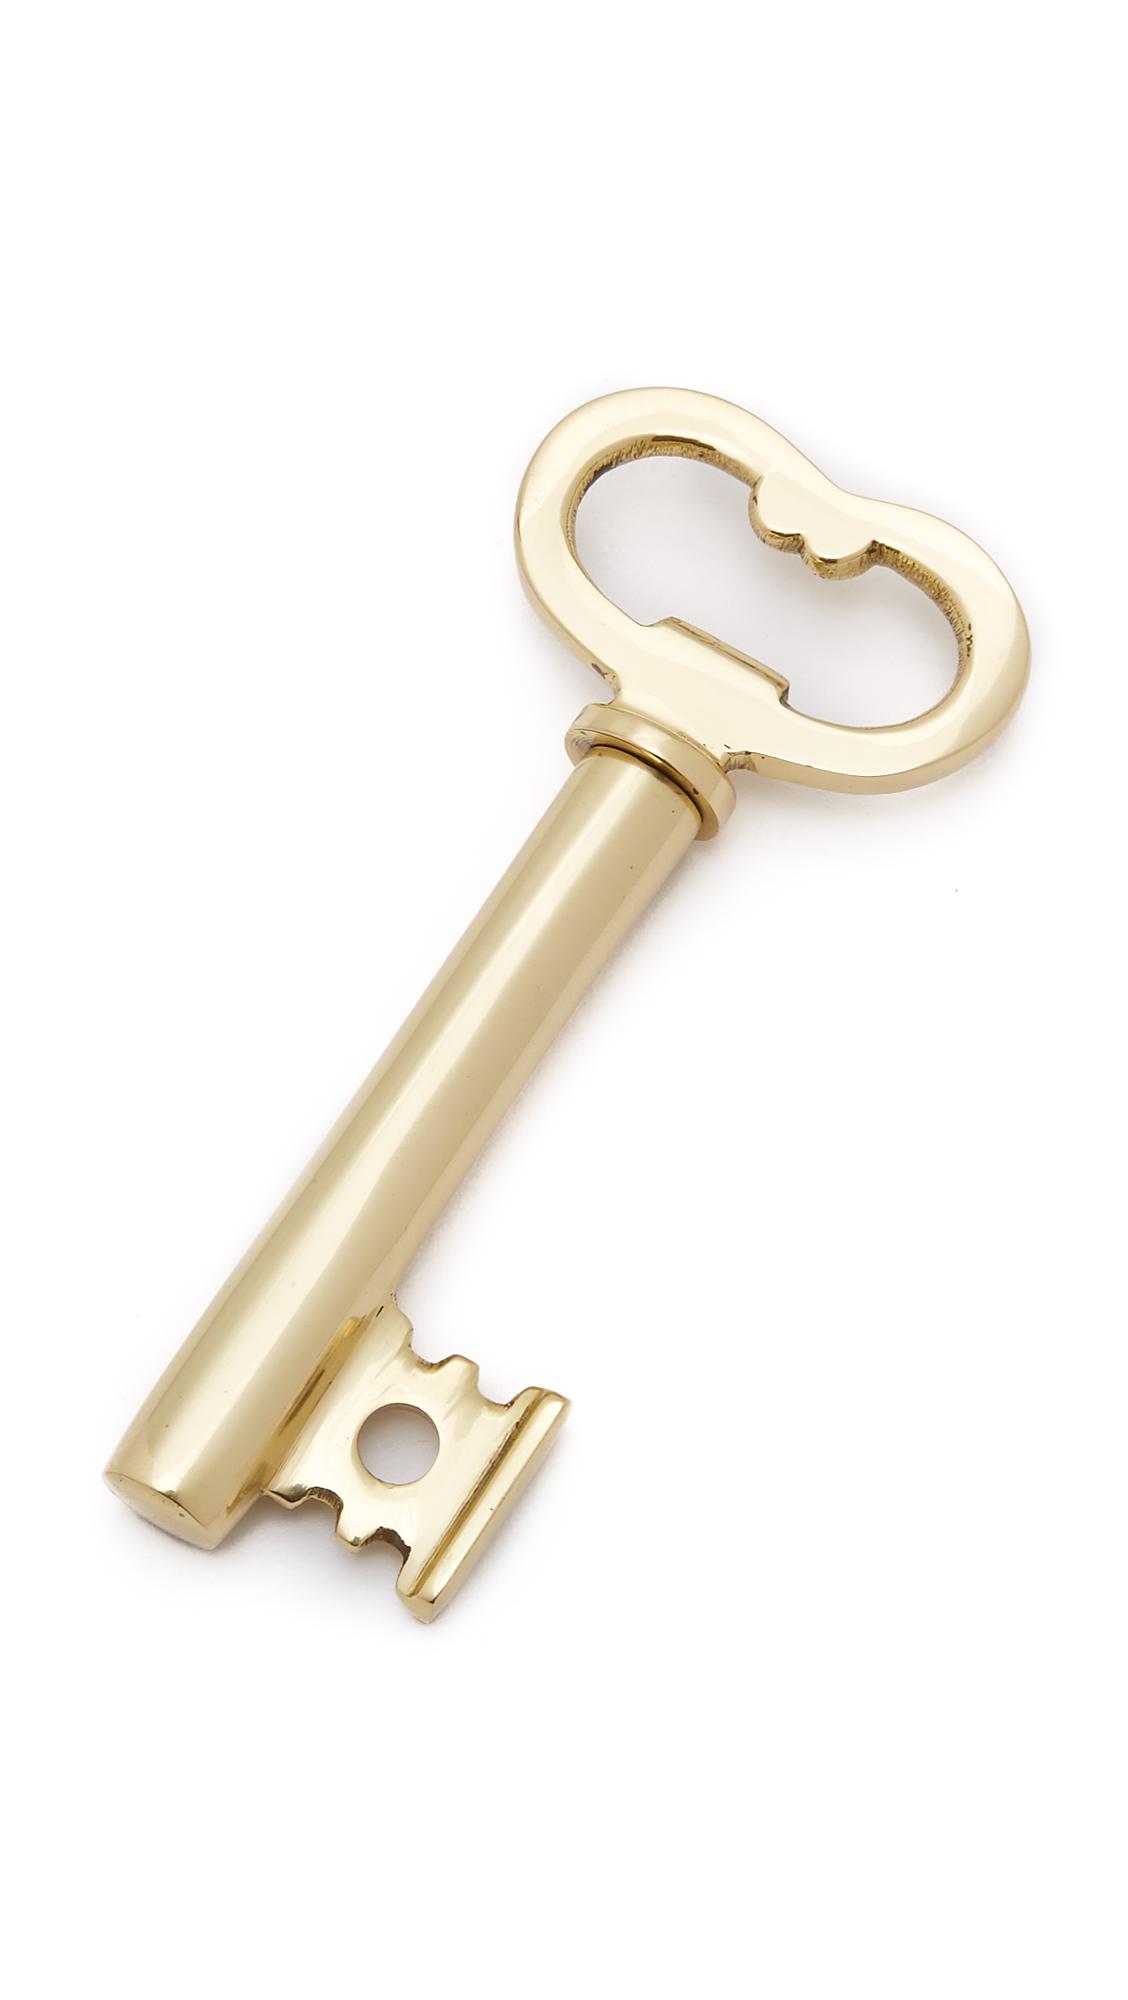 Key Bottle Opener - Bottle Designs